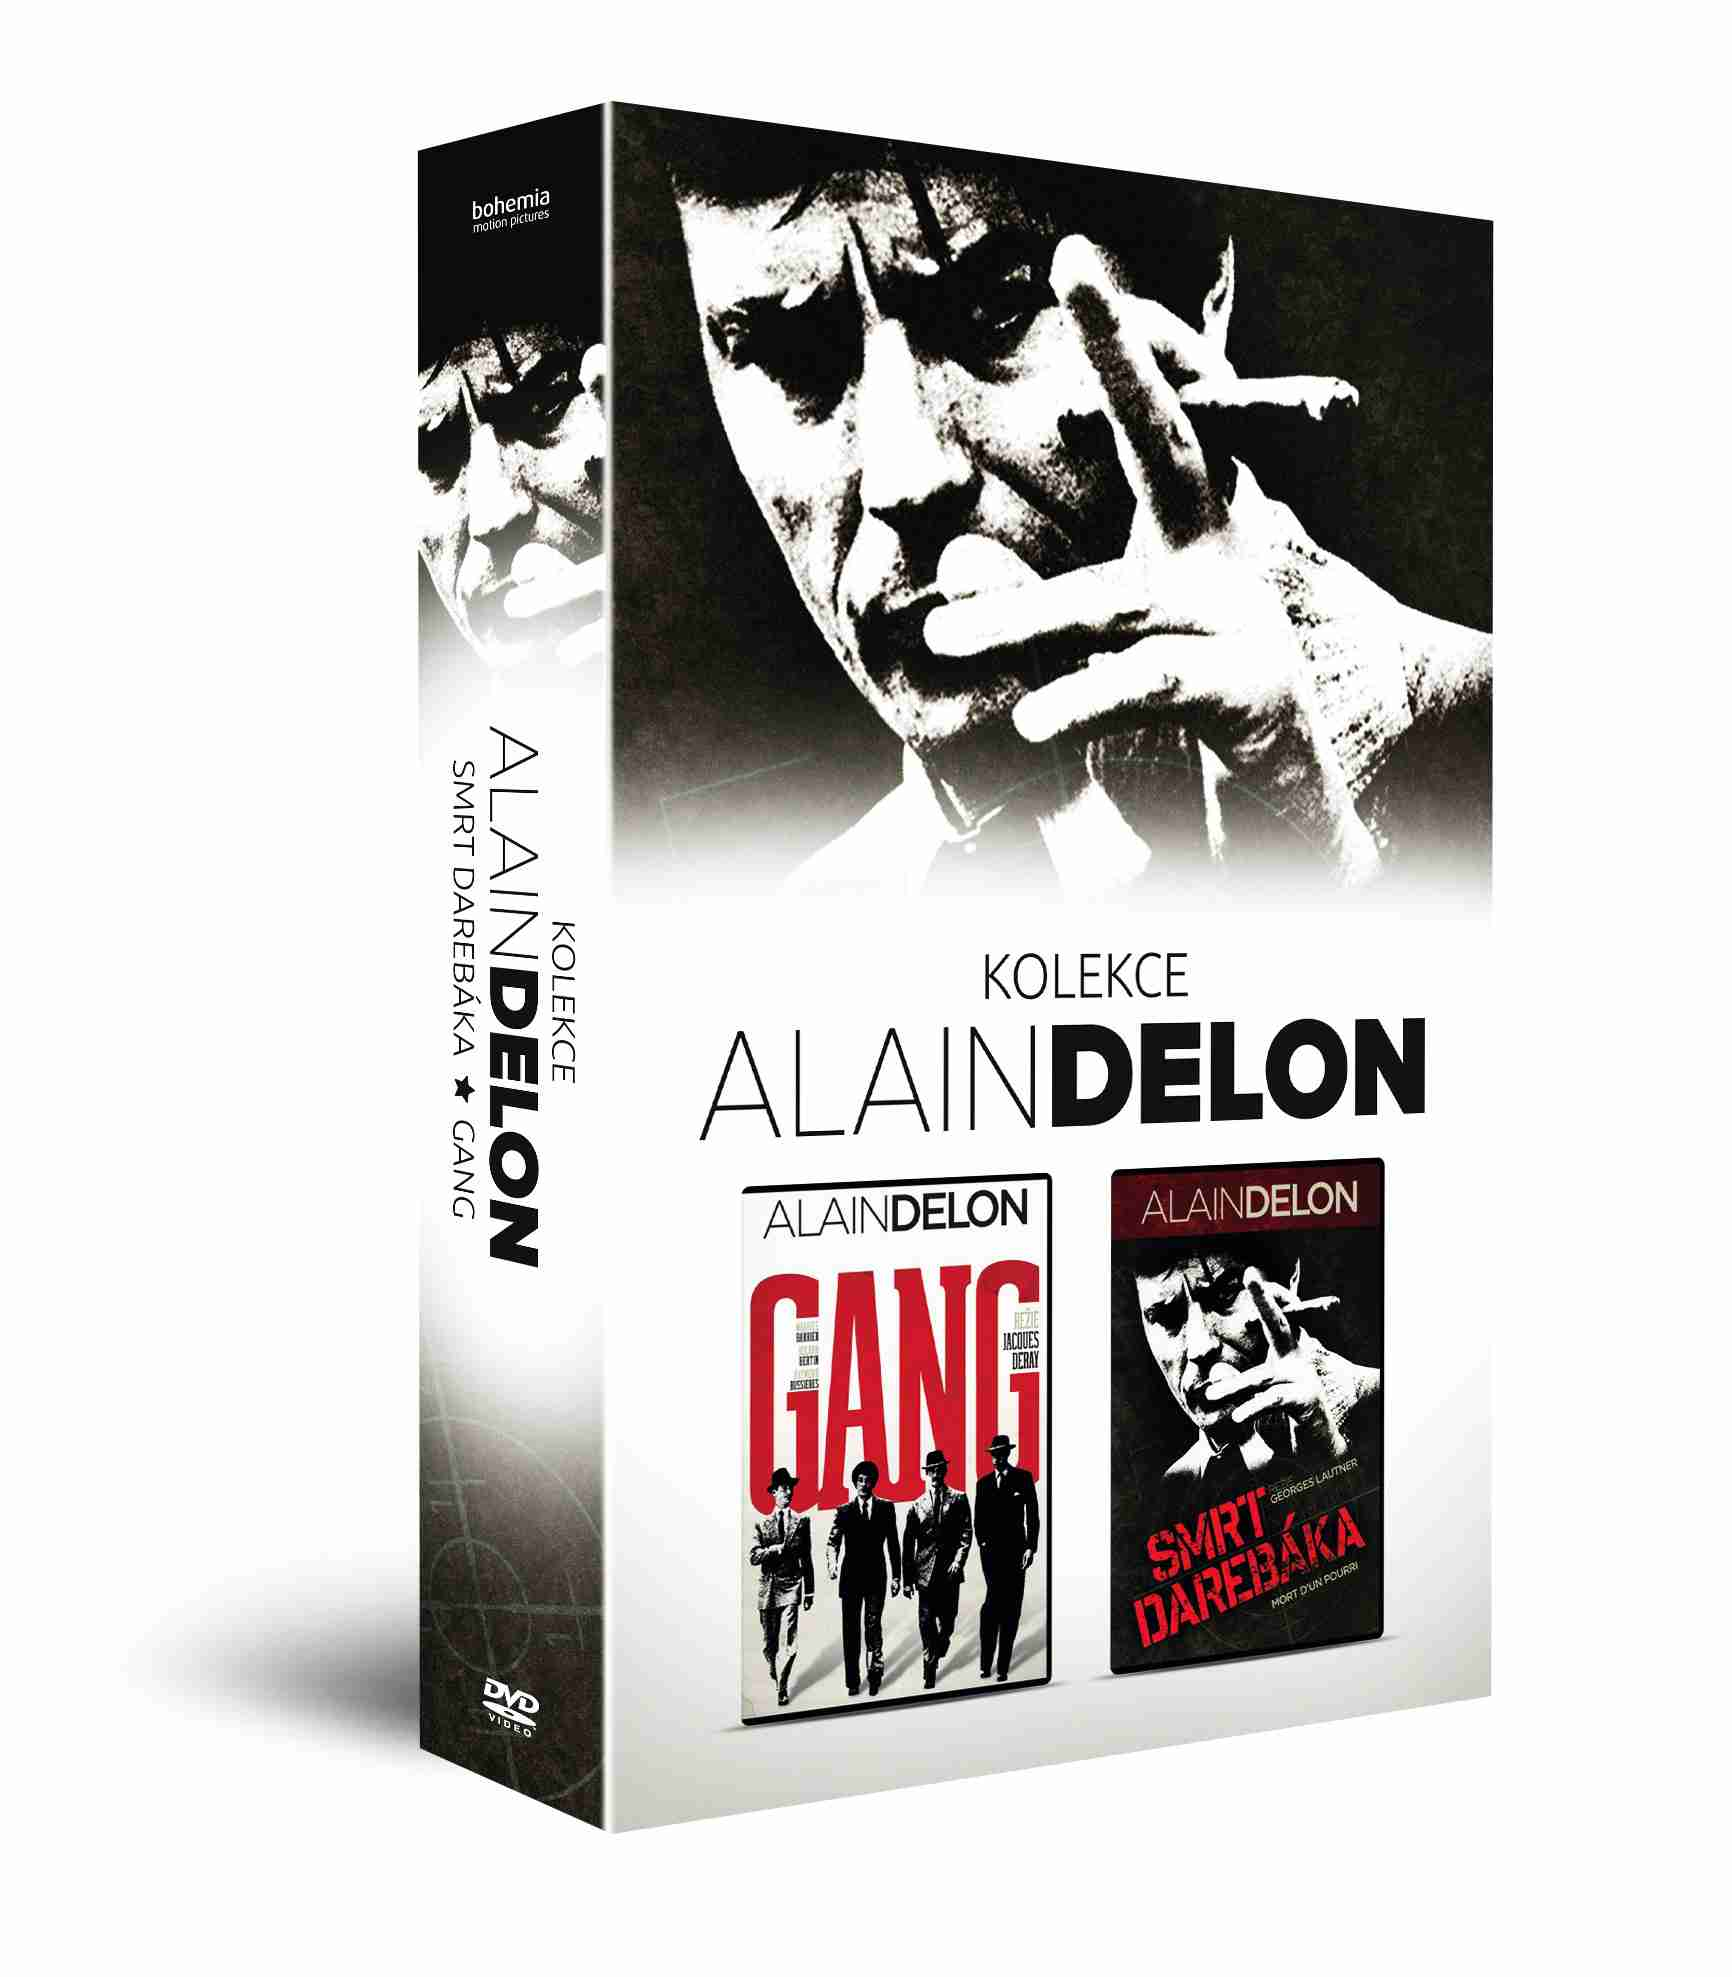 Kolekce Alain Delon